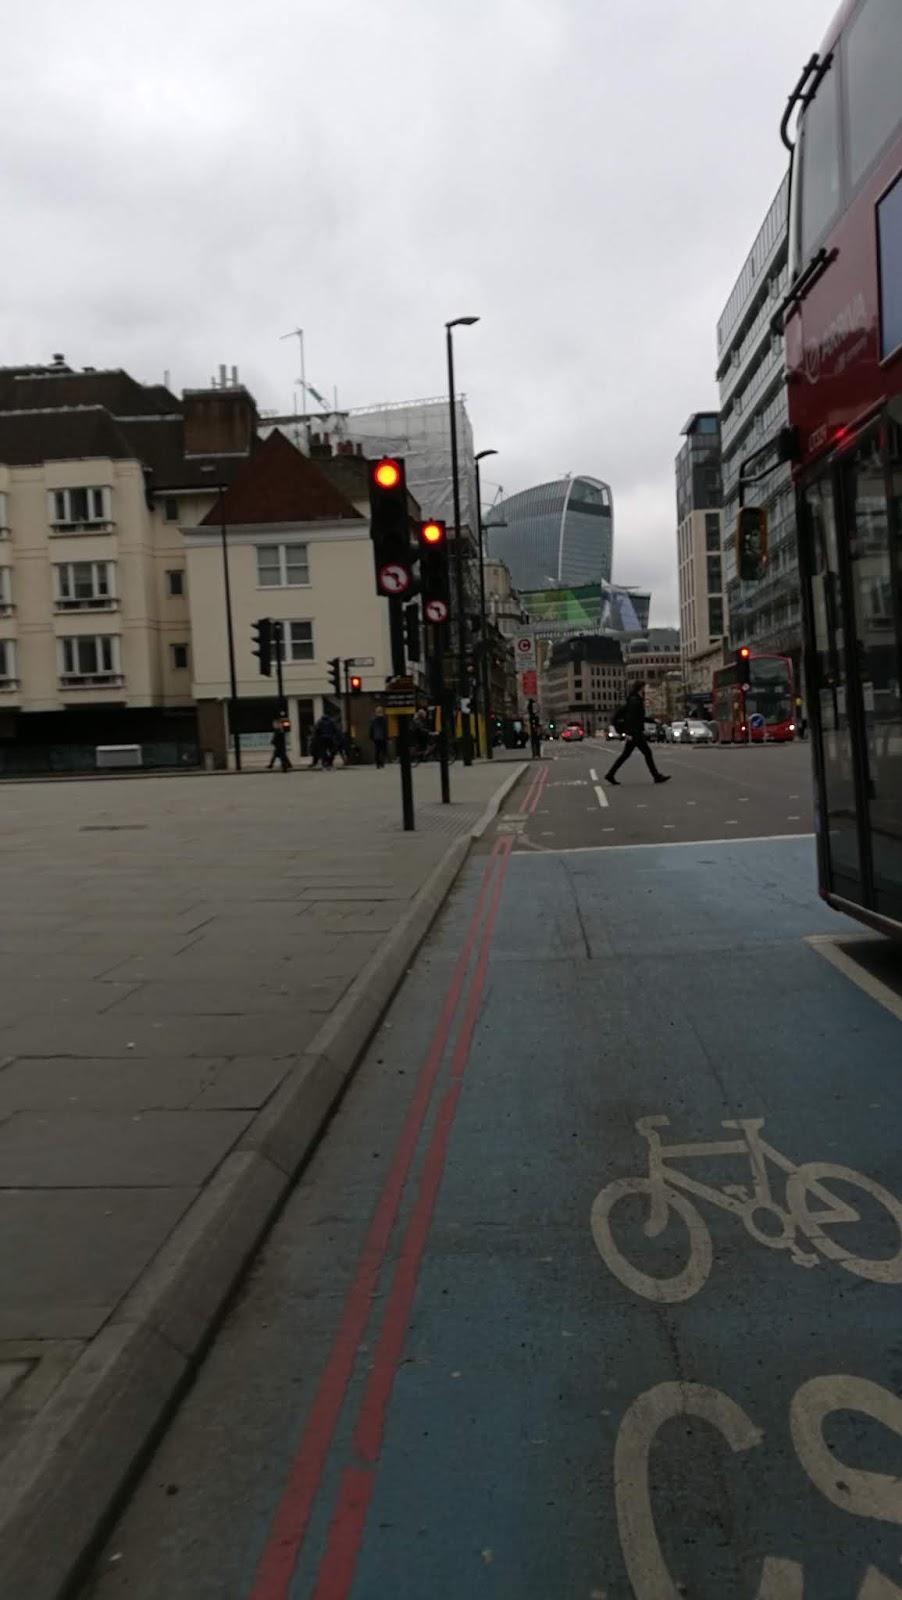 Cycling Club Hackney: Concorde riders visit Fen Court's ...